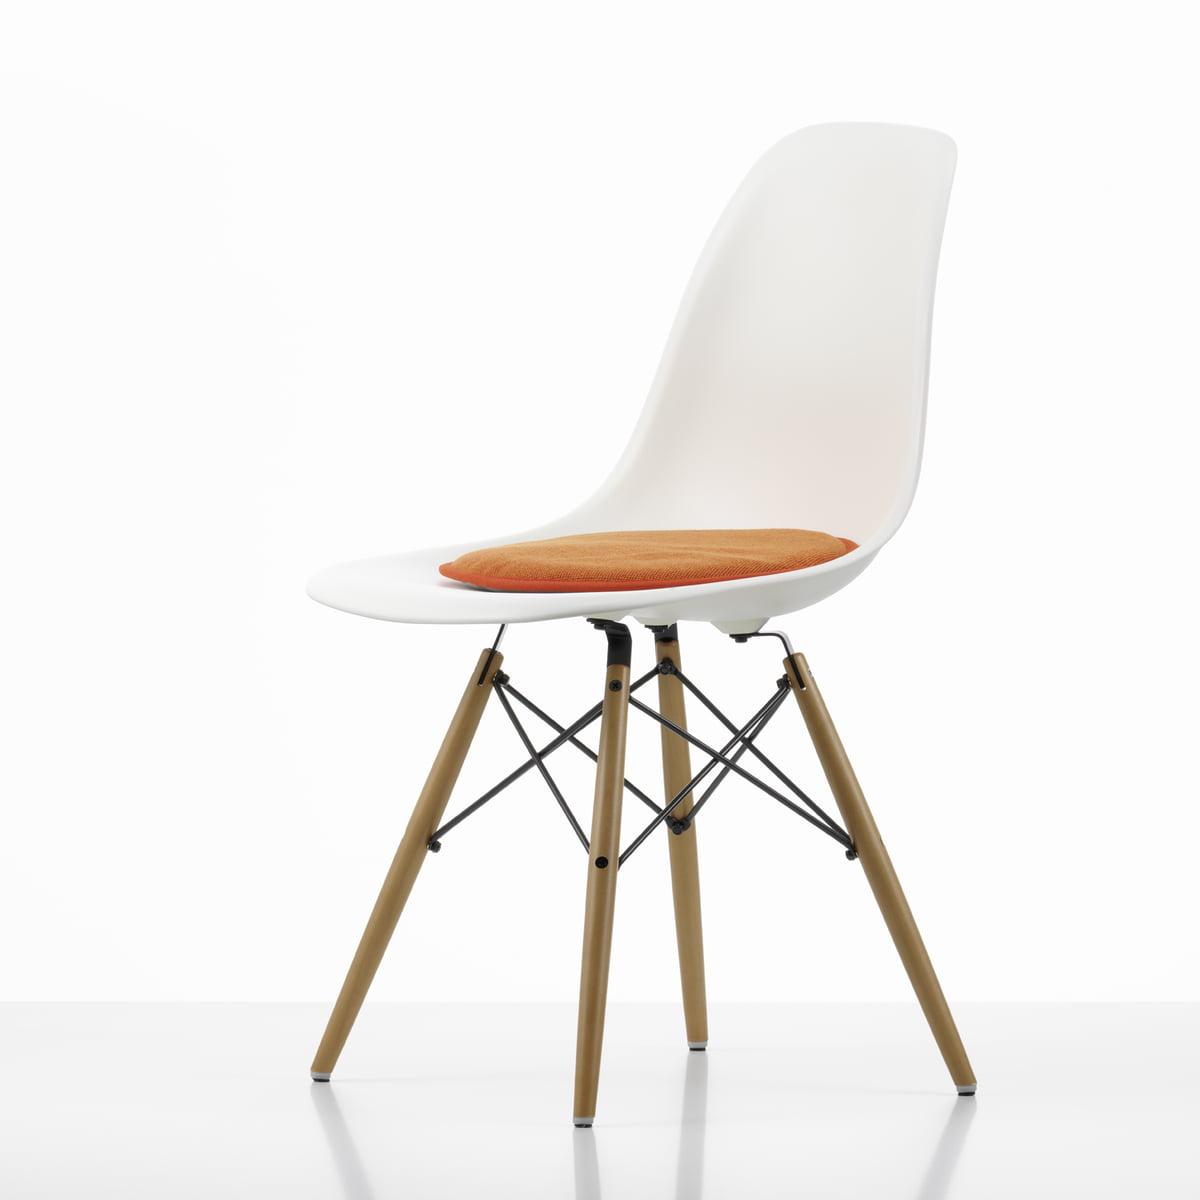 seat dots sitzkissen von vitra connox shop. Black Bedroom Furniture Sets. Home Design Ideas